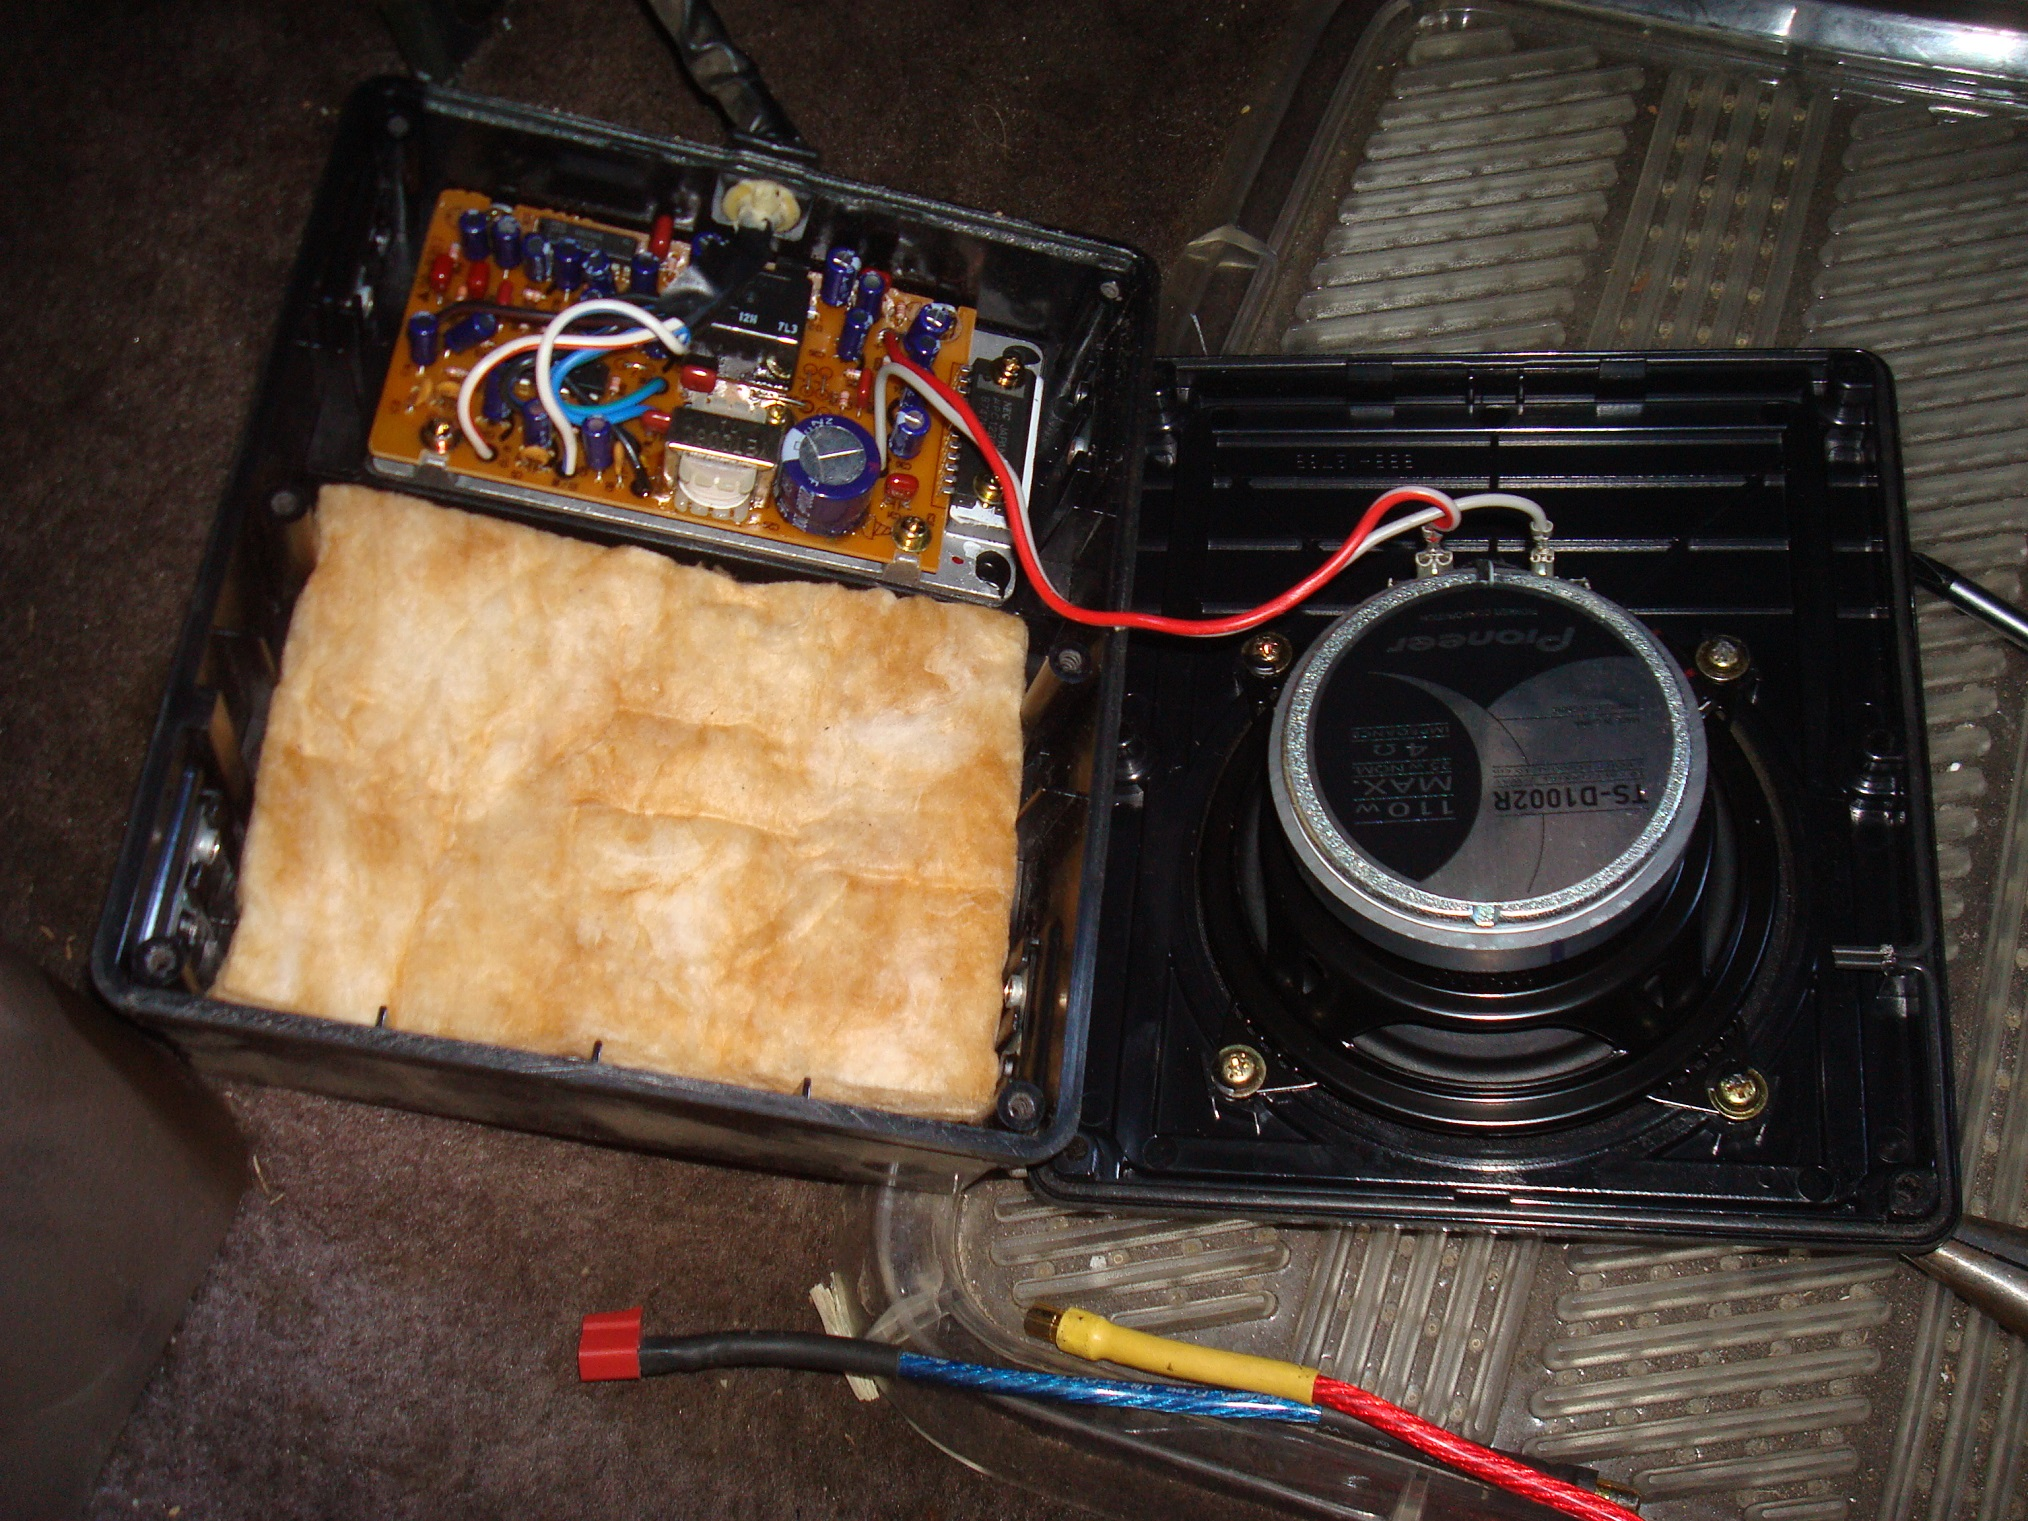 mbc 5500 battery tester manual